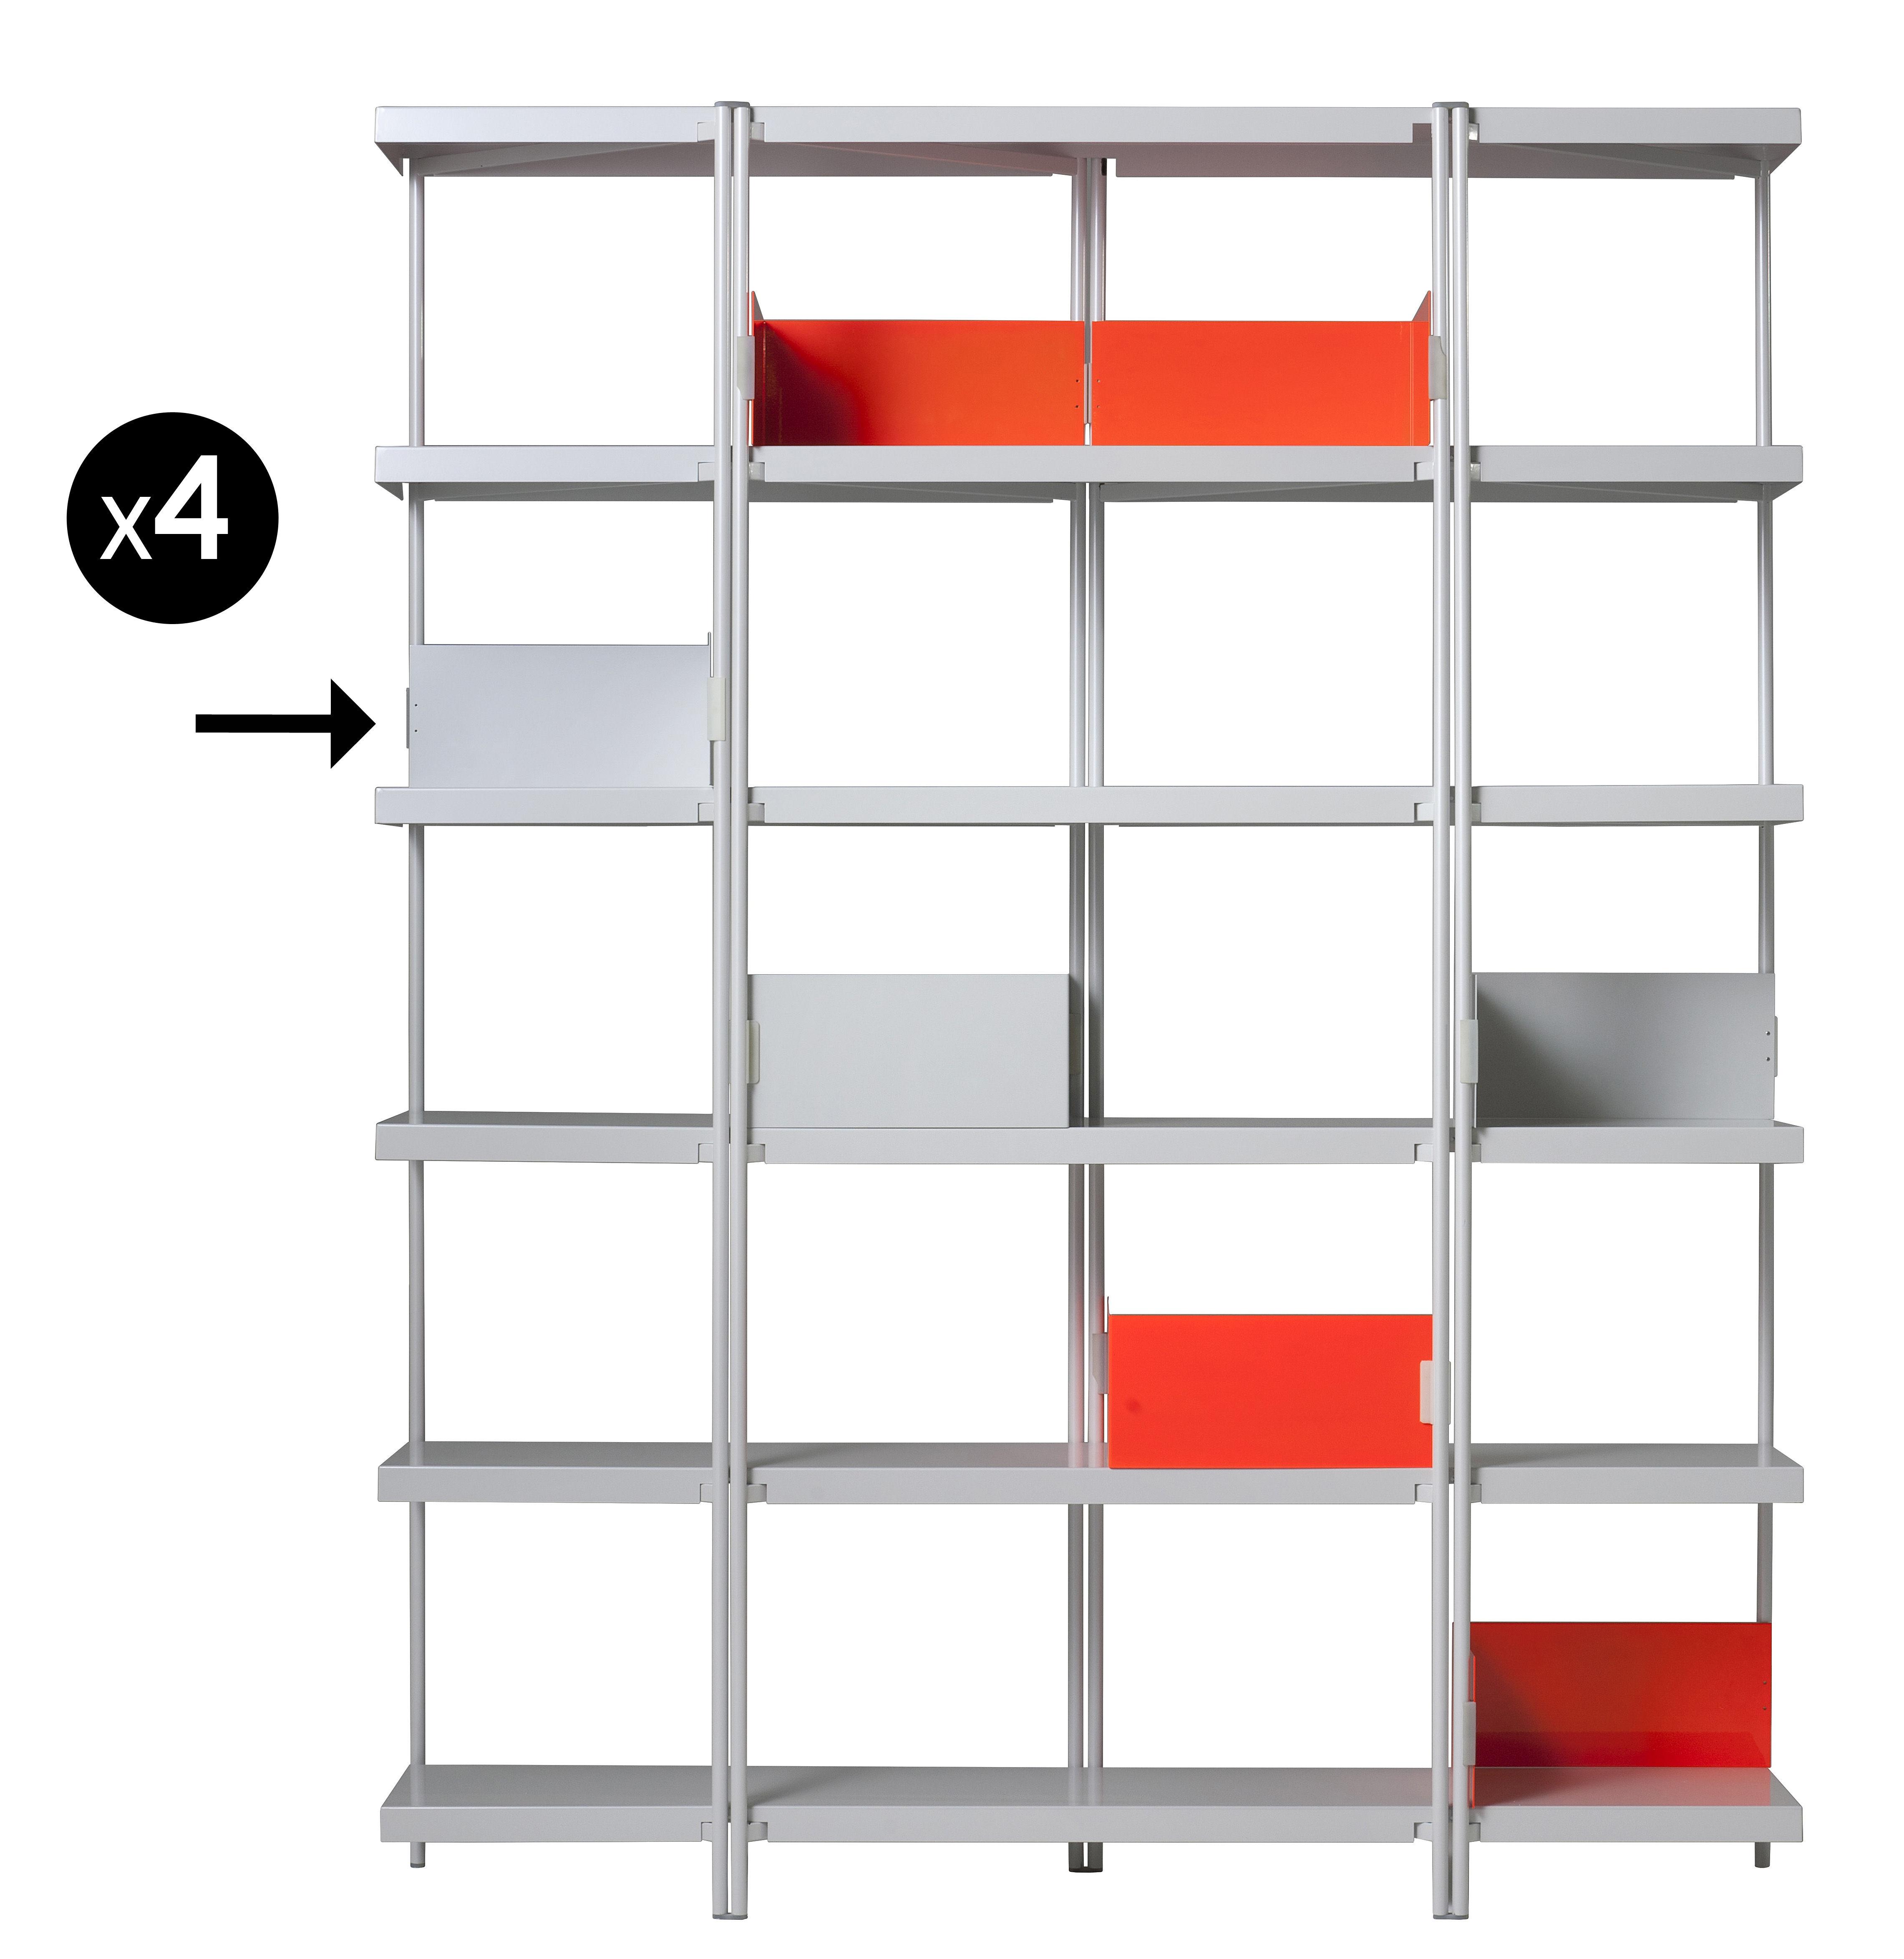 serre livres pour biblioth que zigzag lot de 4 blanc driade made in design. Black Bedroom Furniture Sets. Home Design Ideas